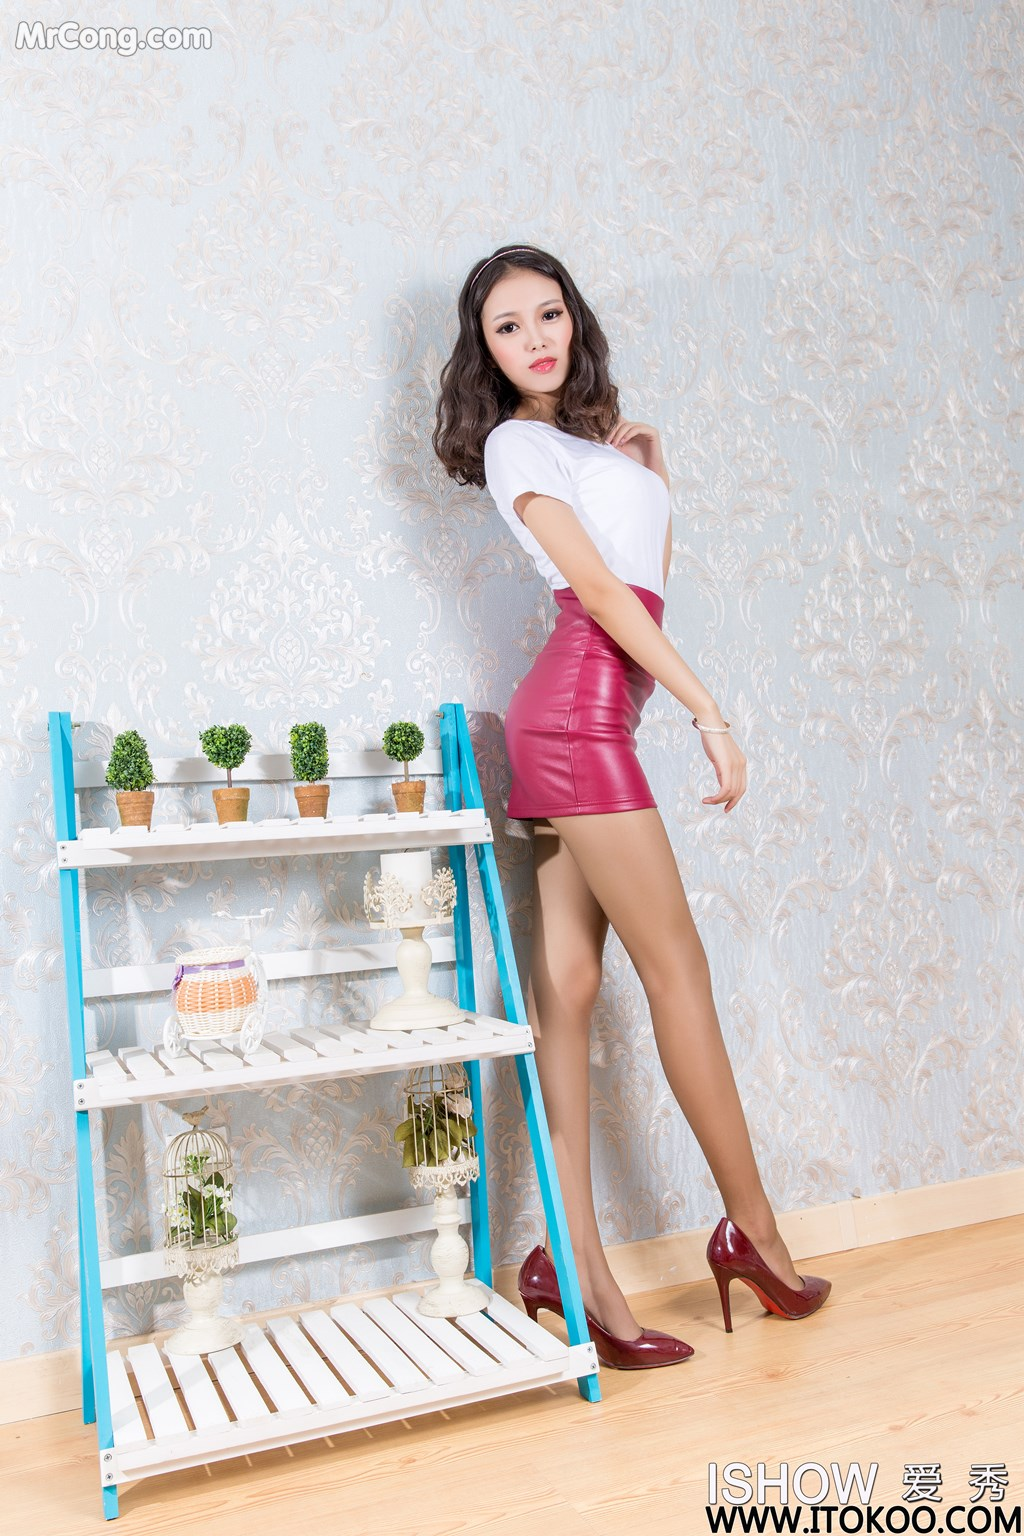 Image ISHOW-No.141-Adela-Xin-Ya-MrCong.com-004 in post ISHOW No.141: Người mẫu Adela (馨雅) (31 ảnh)